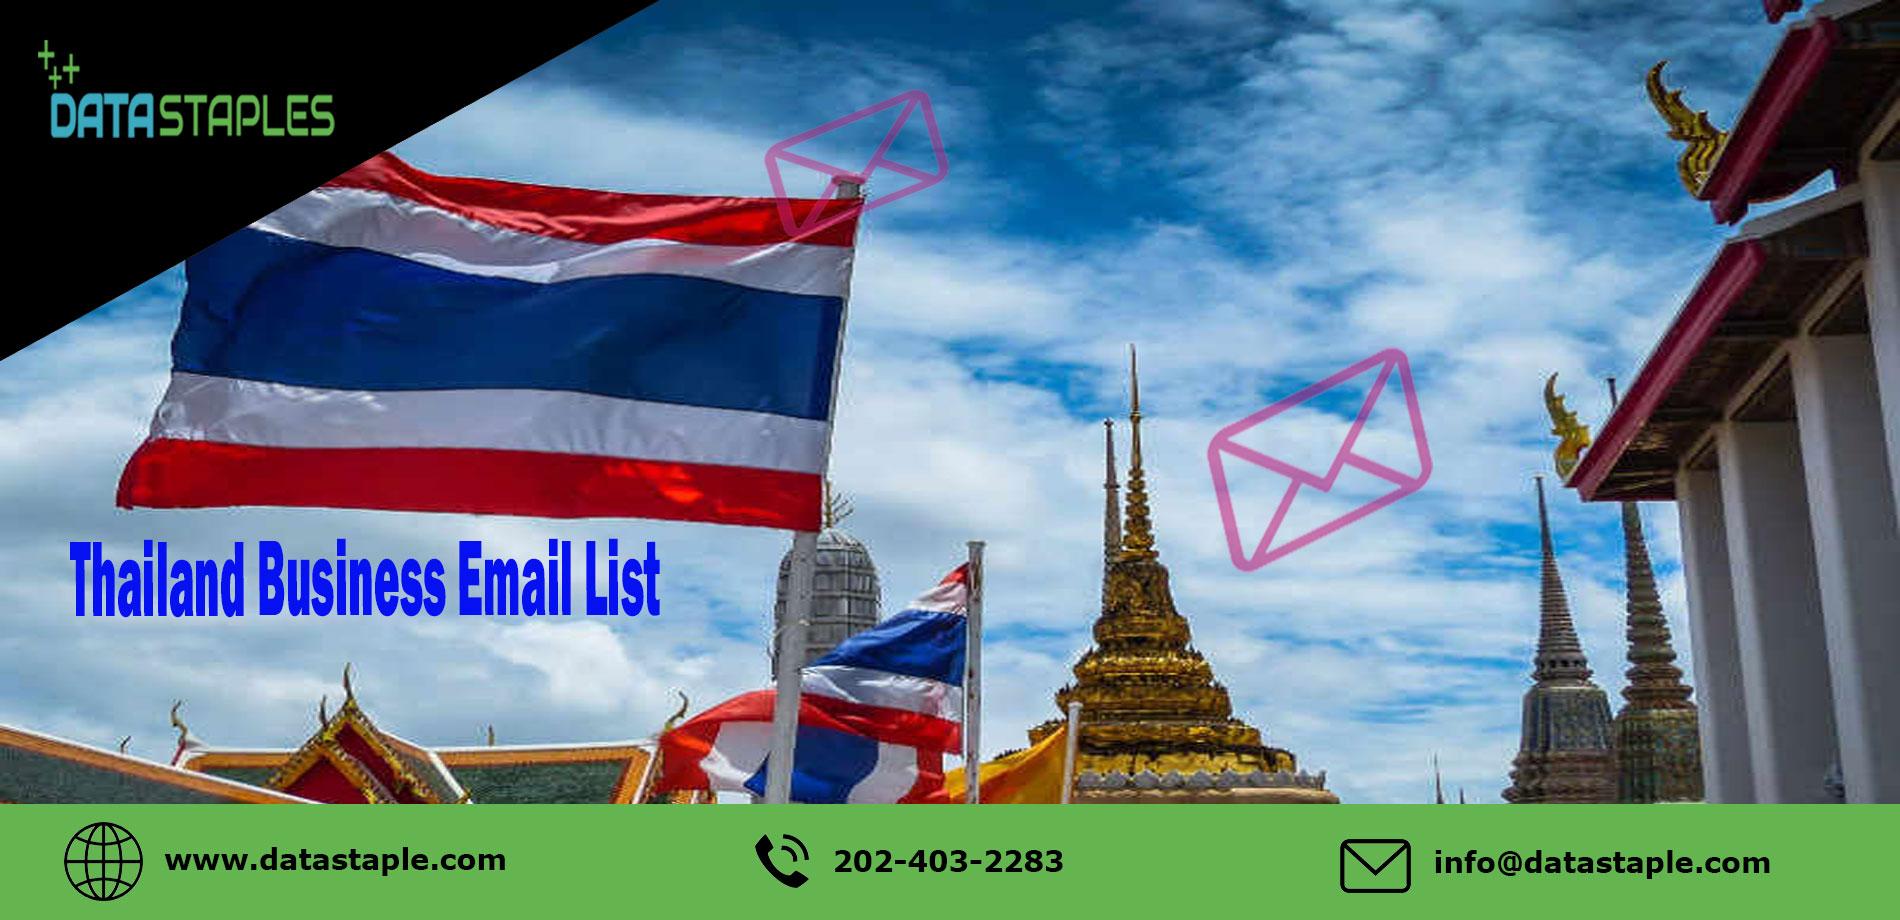 Thailand Business Email List   DataStaples